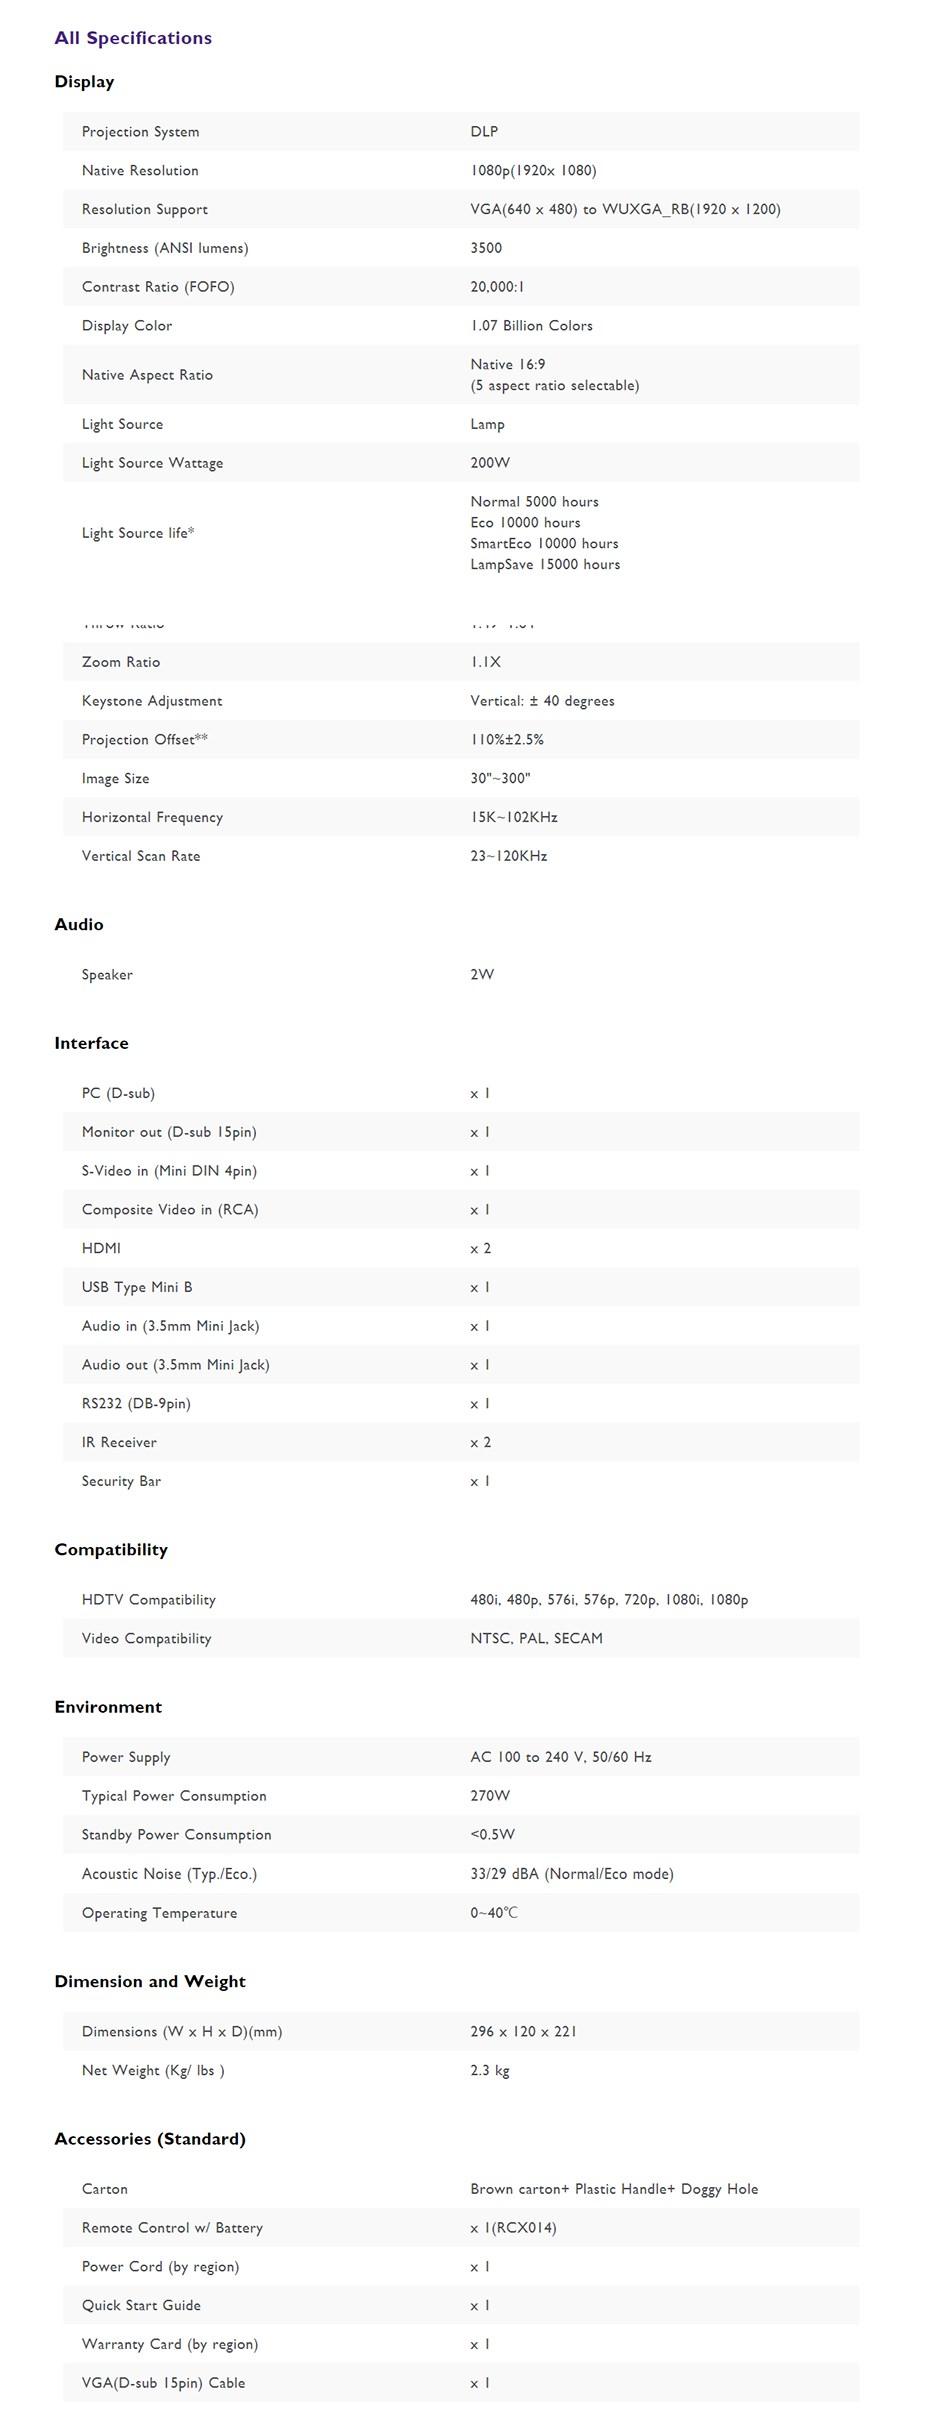 BenQ MH550 Eco-Friendly FHD 1080p Business DLP Projector - Desktop Overview 2